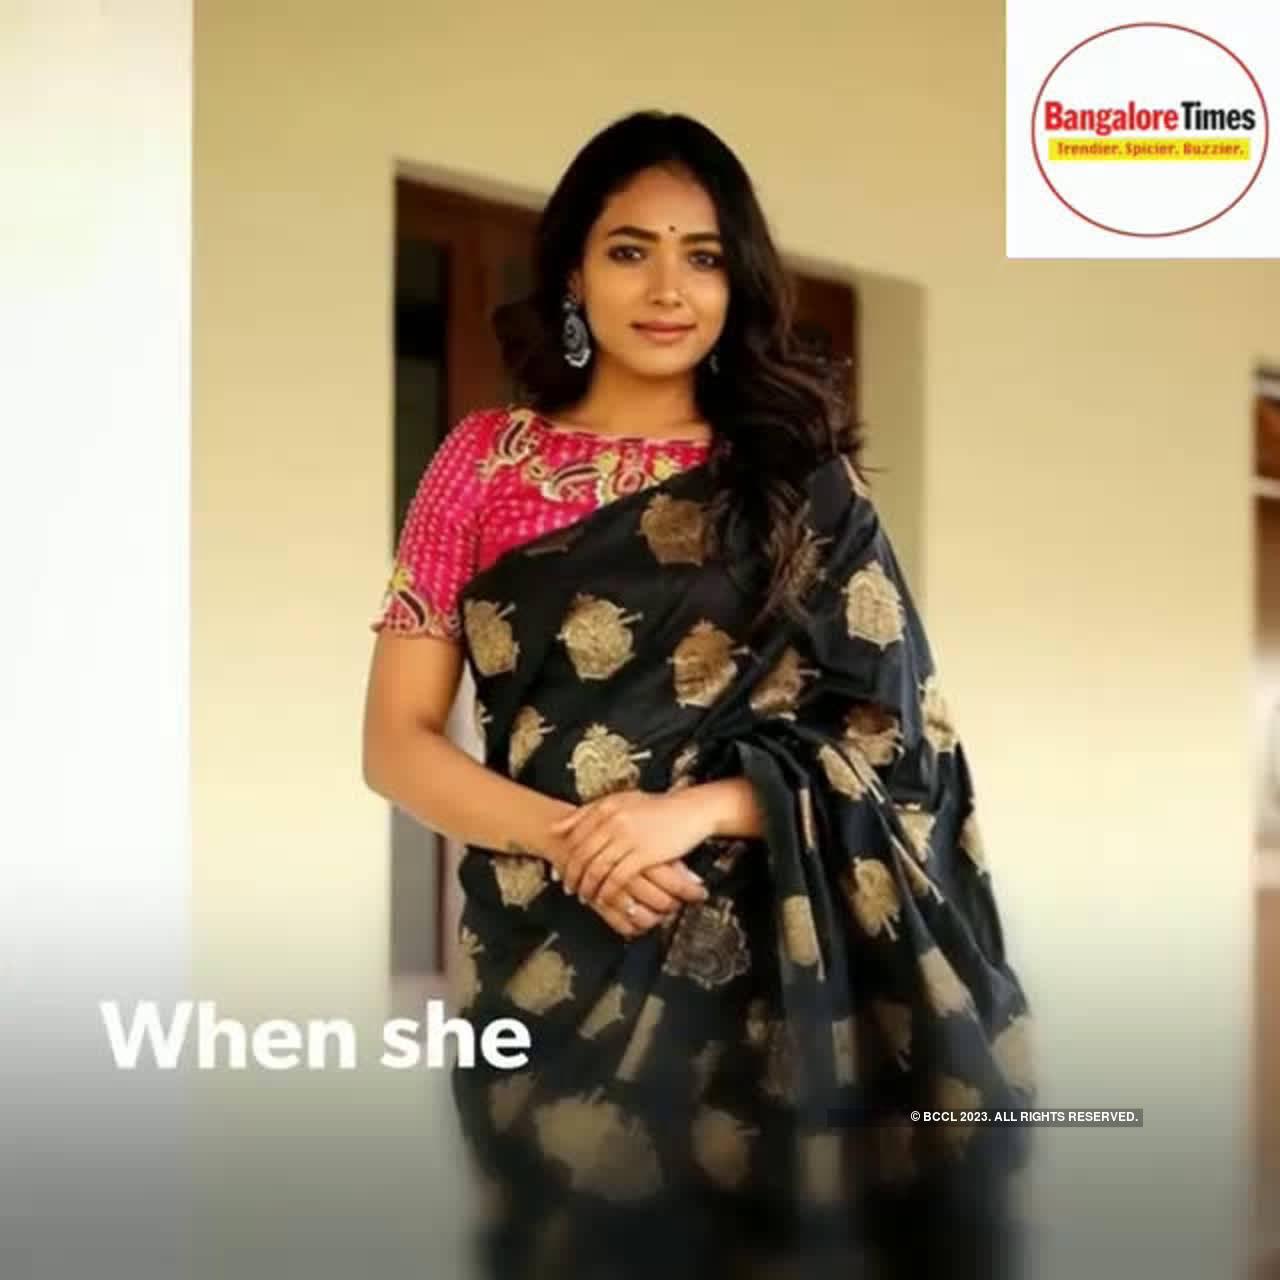 7 times Anupama Gowda slayed on Instagram